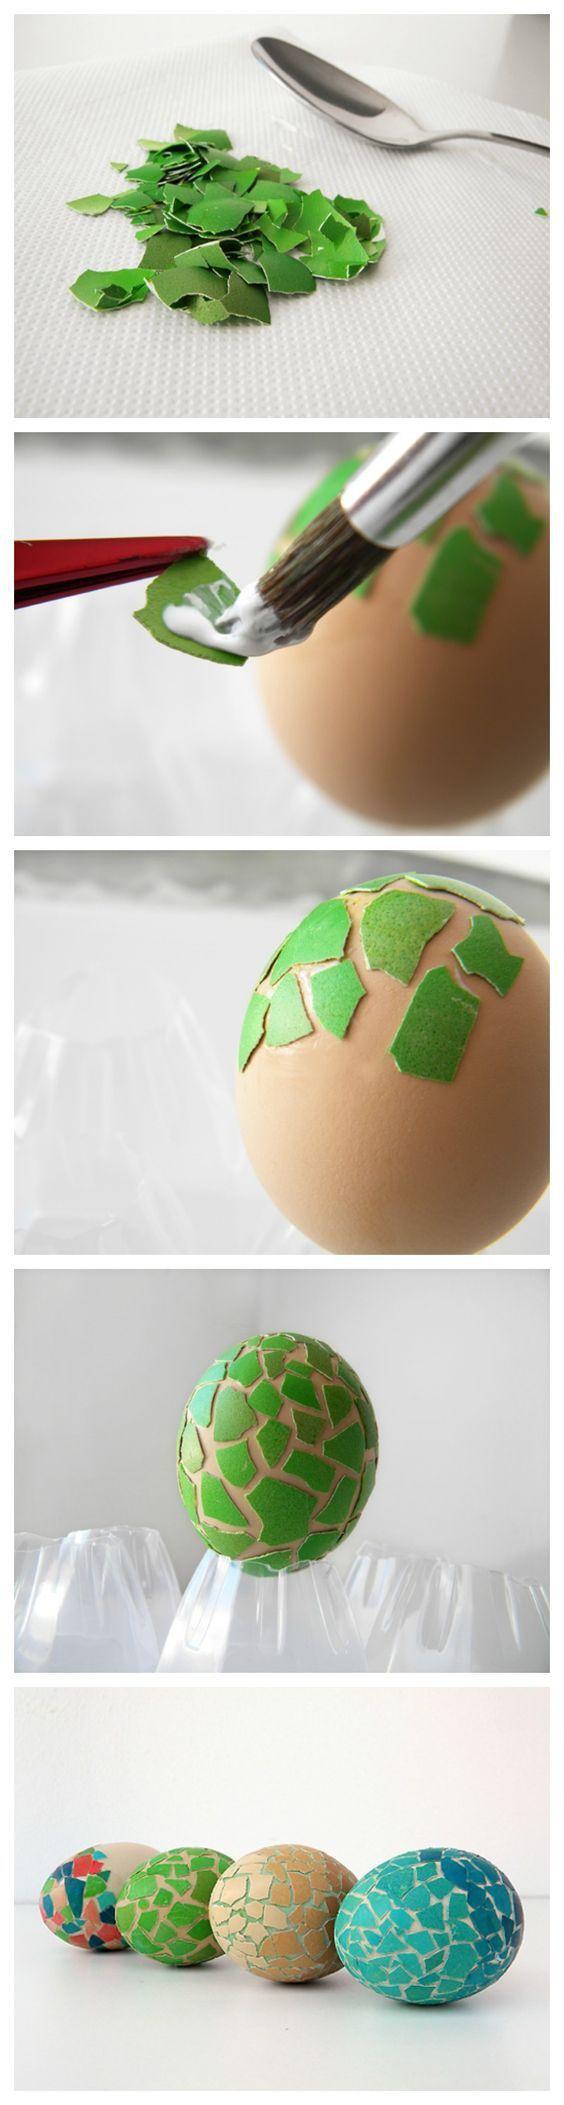 fun ways to dye easter eggs, mosaic